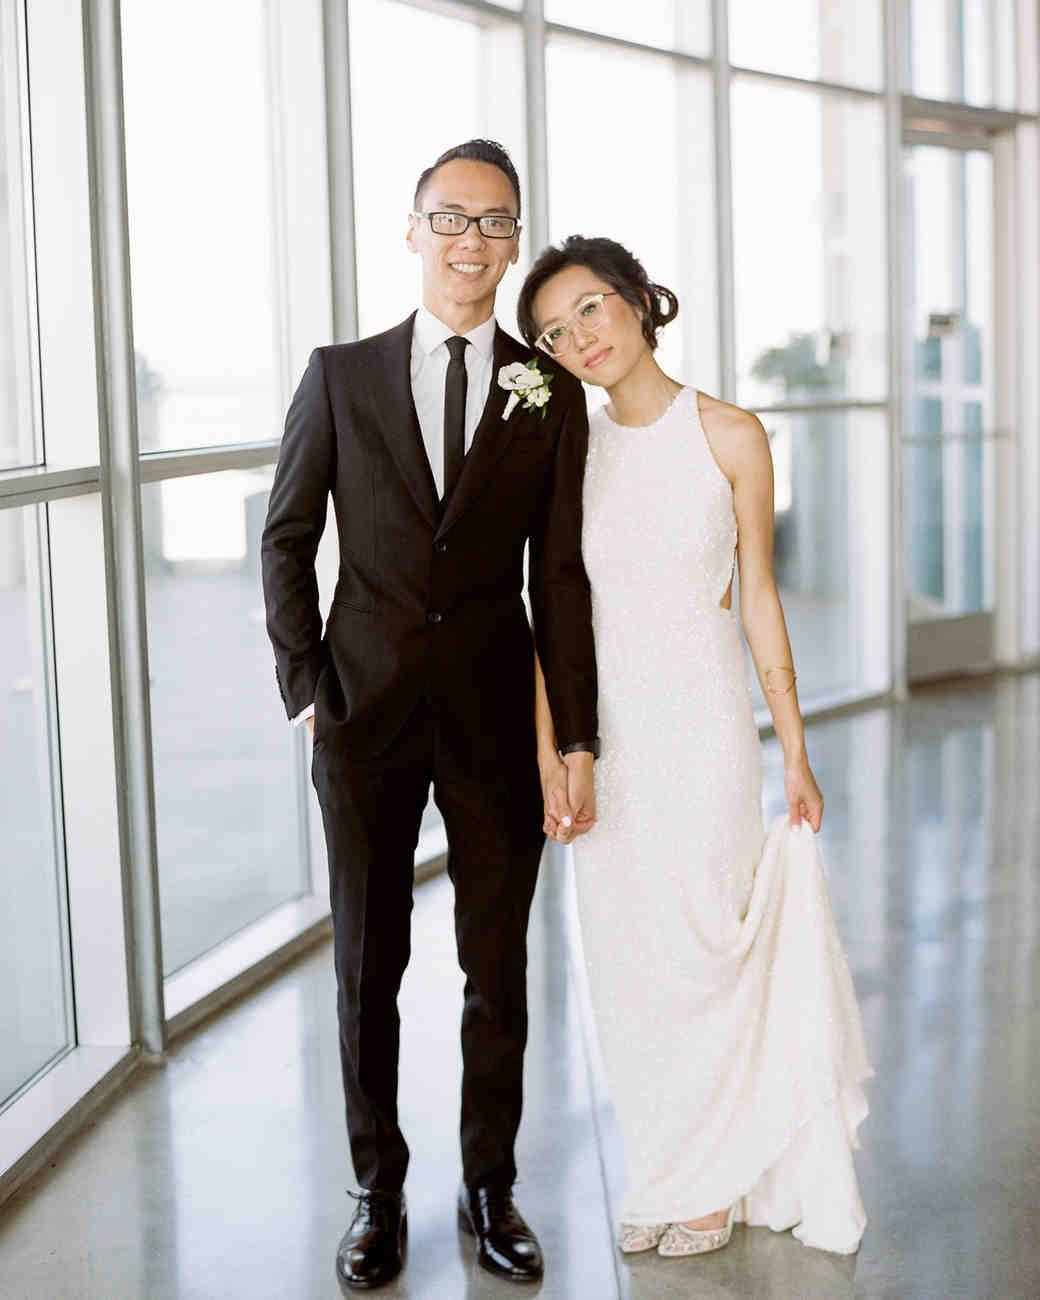 wedding bride and groom pose near windows